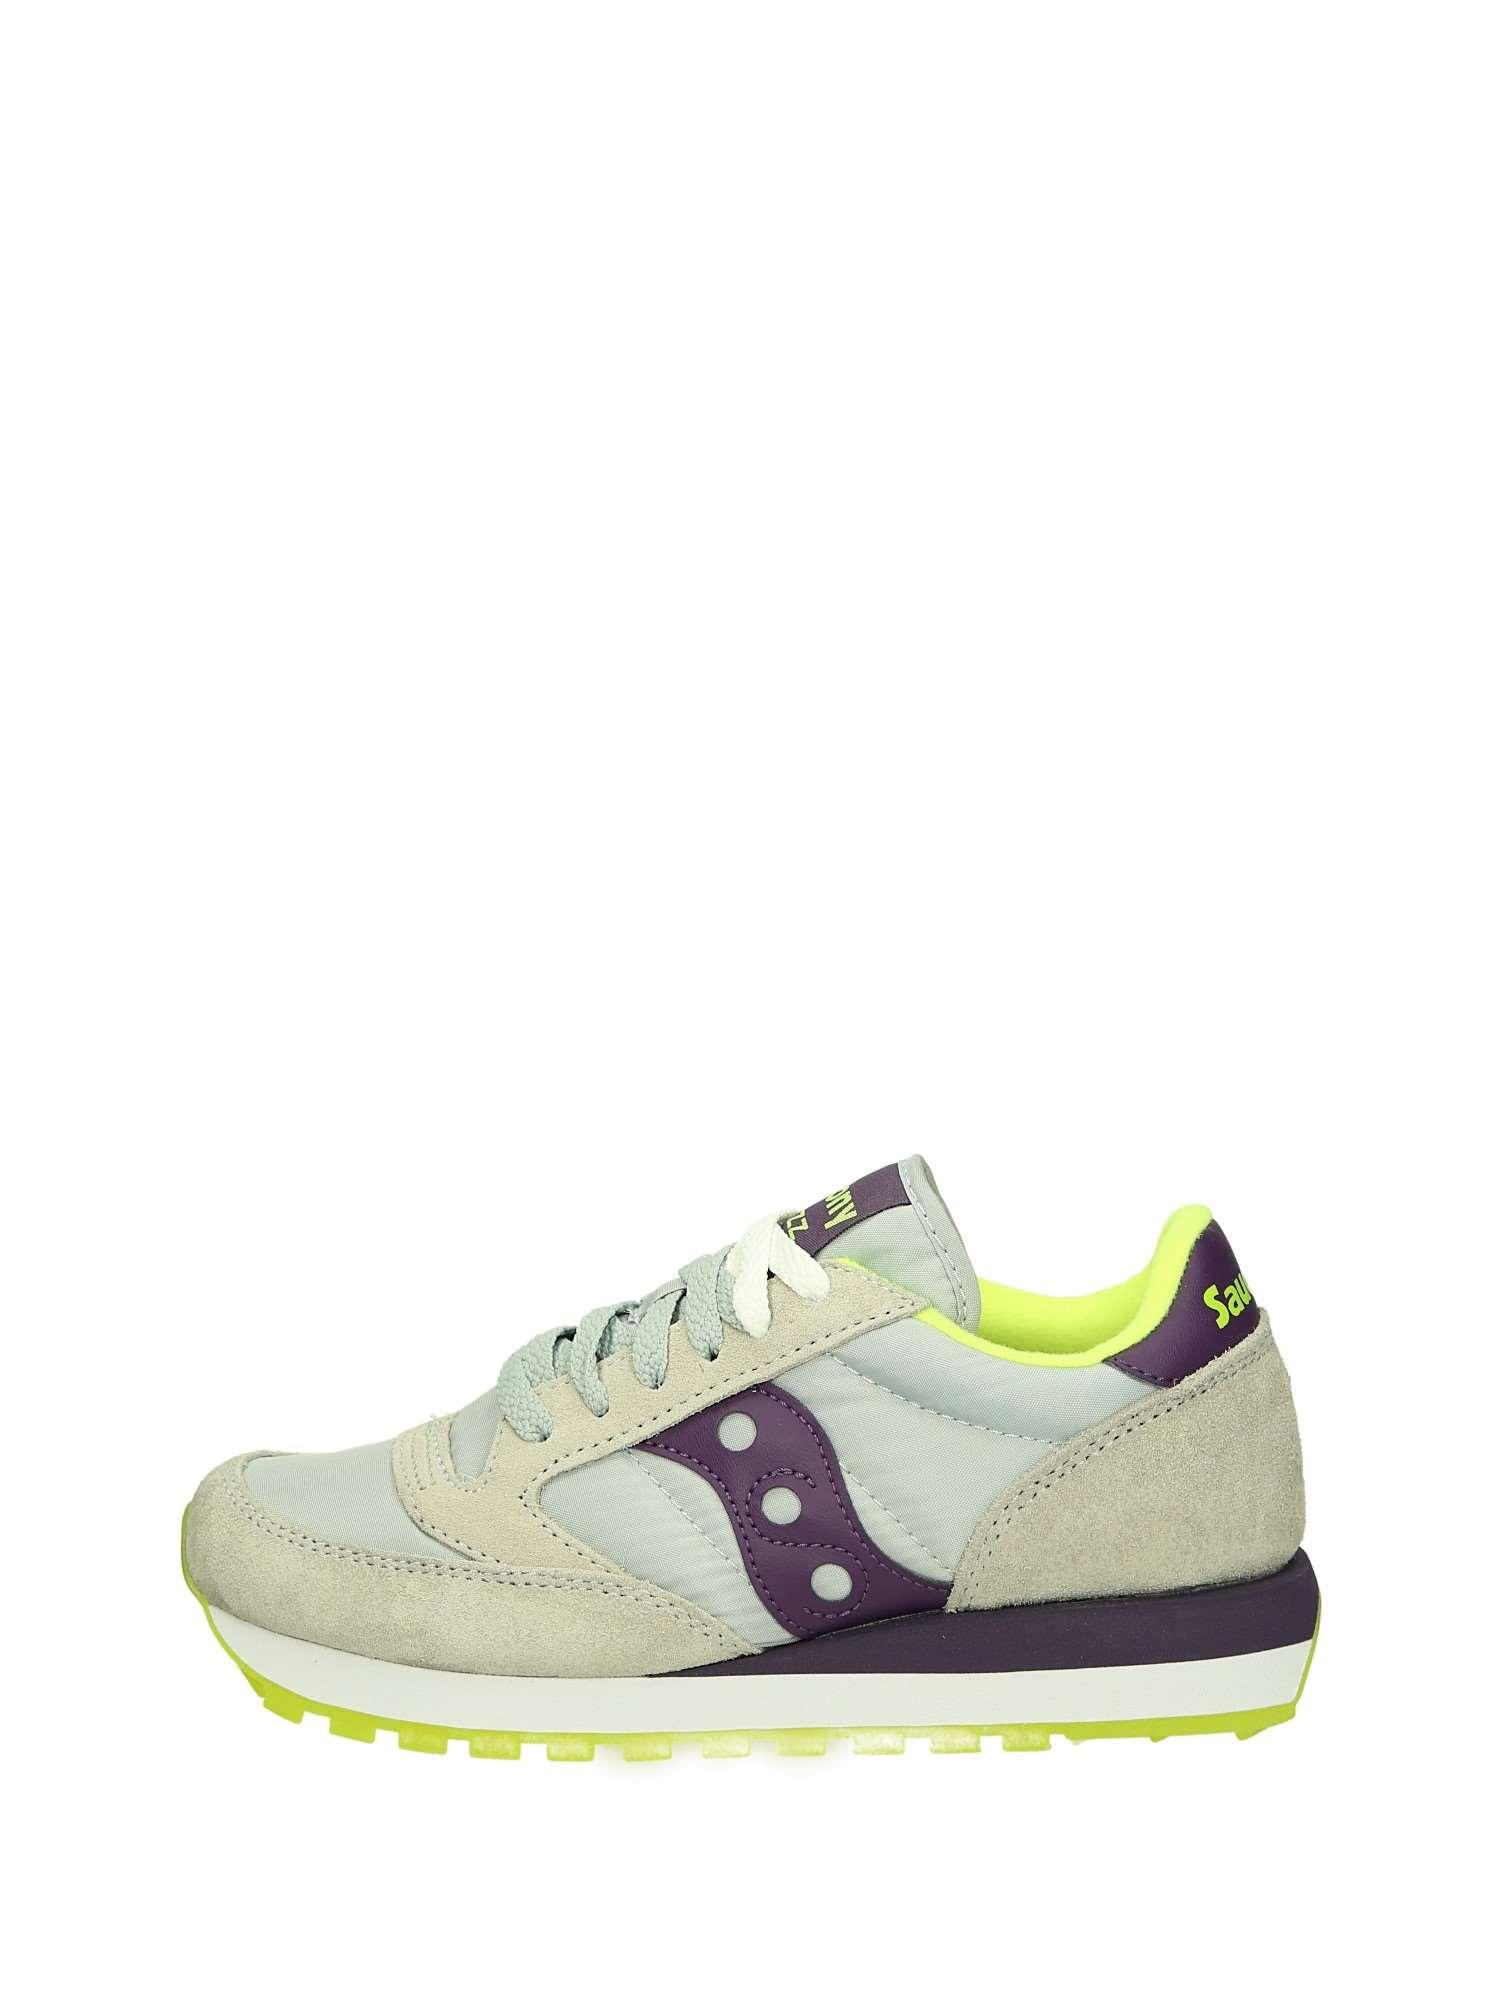 Saucony Sneakers Basse Donna Grigio Viola | Lalilina